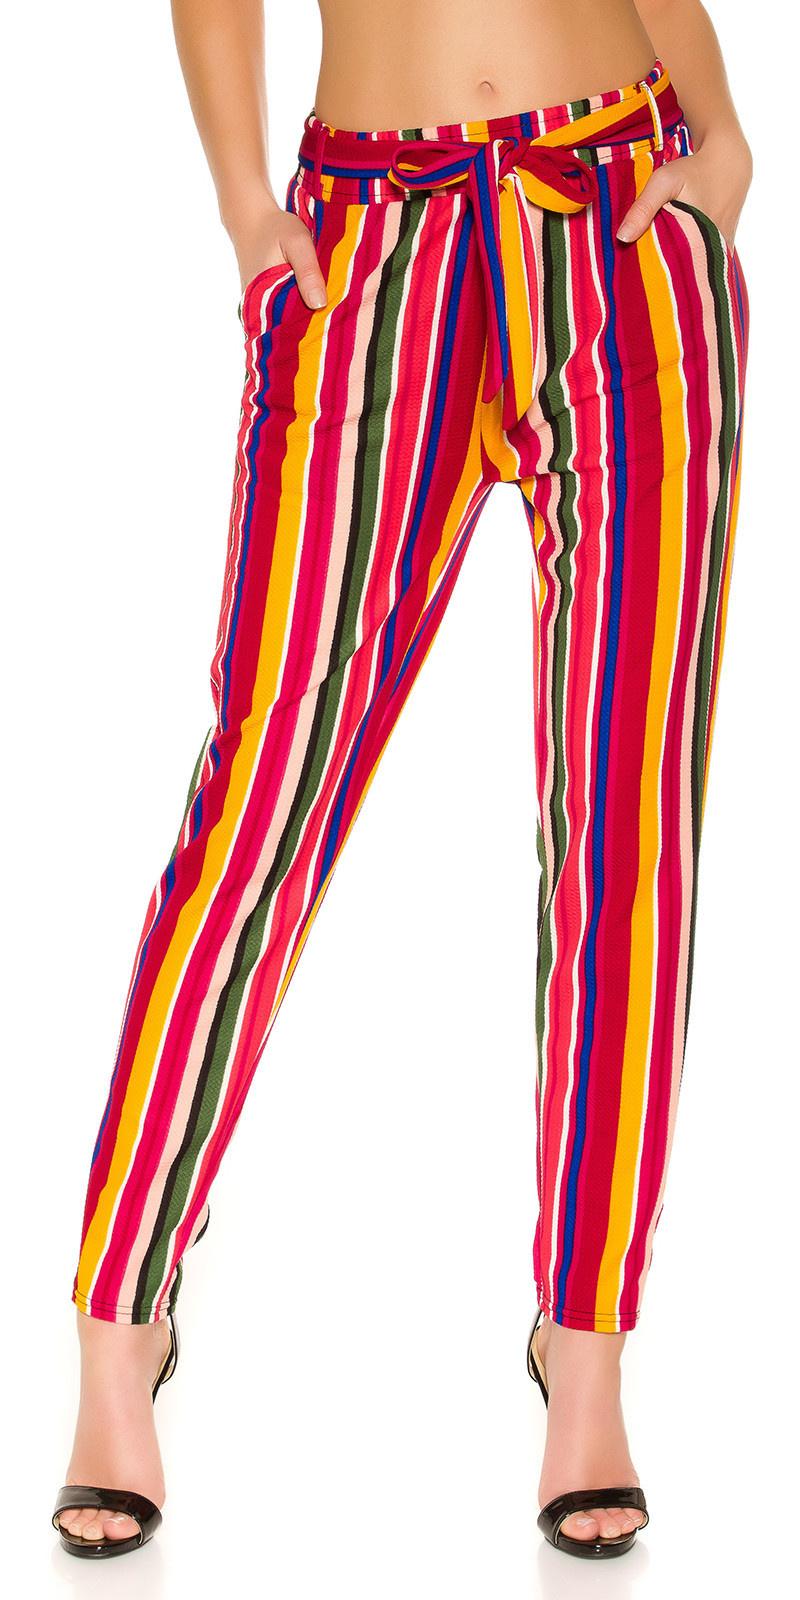 Trendy stoffen broek met riem mosterdgeel